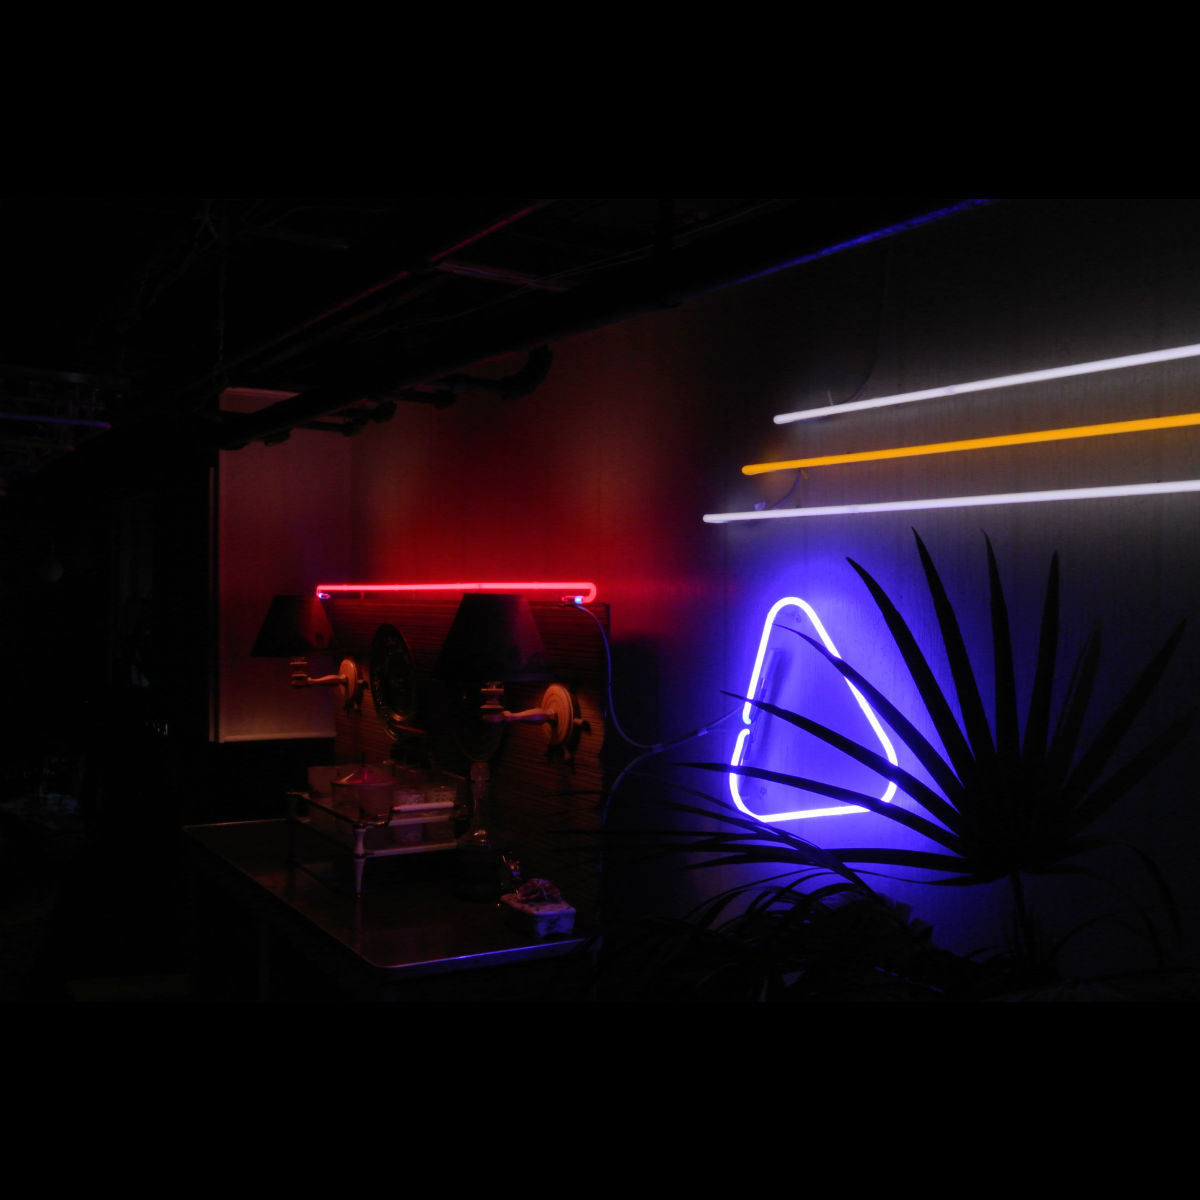 Custom Neon Mood Lighting by John Barton - BartonNeonMagic.com